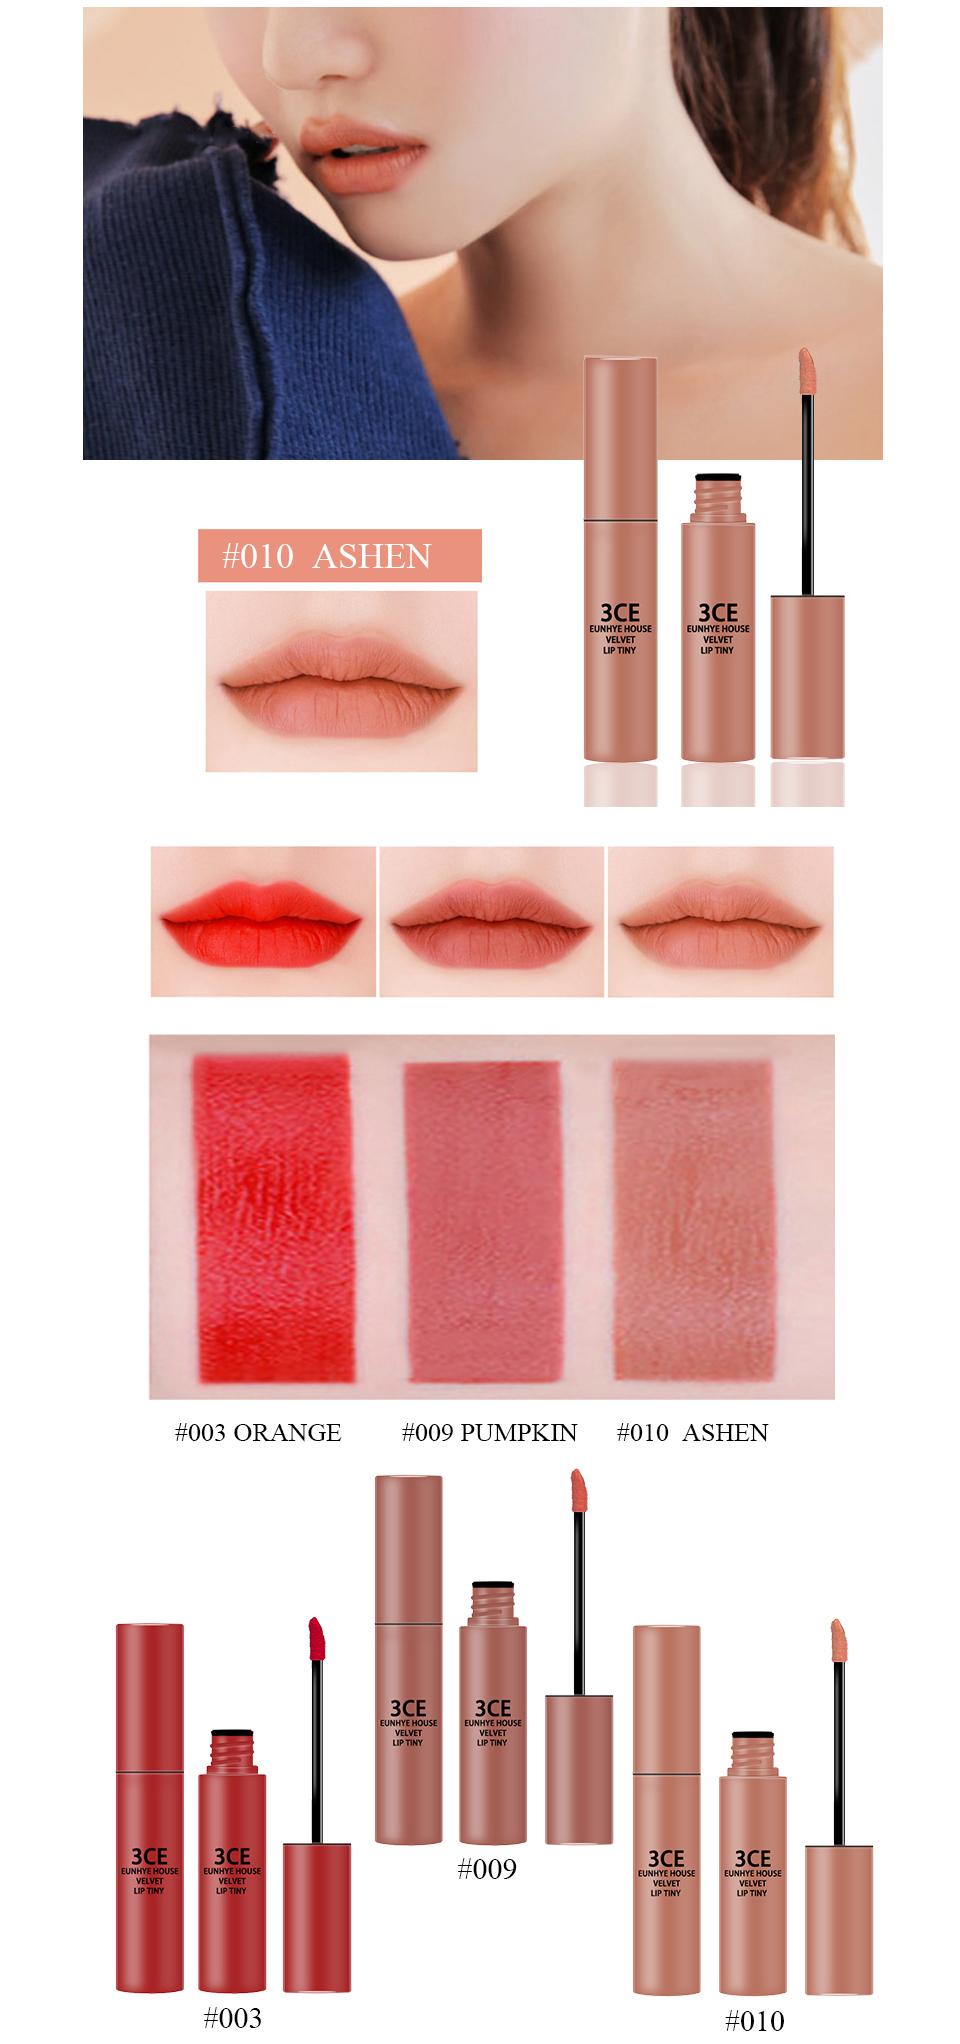 3CE Eunhye House Brand New Lip Cosmetics 3 colors Lip glaze Moisturizer Long-lasting Lip Makeup for common 8